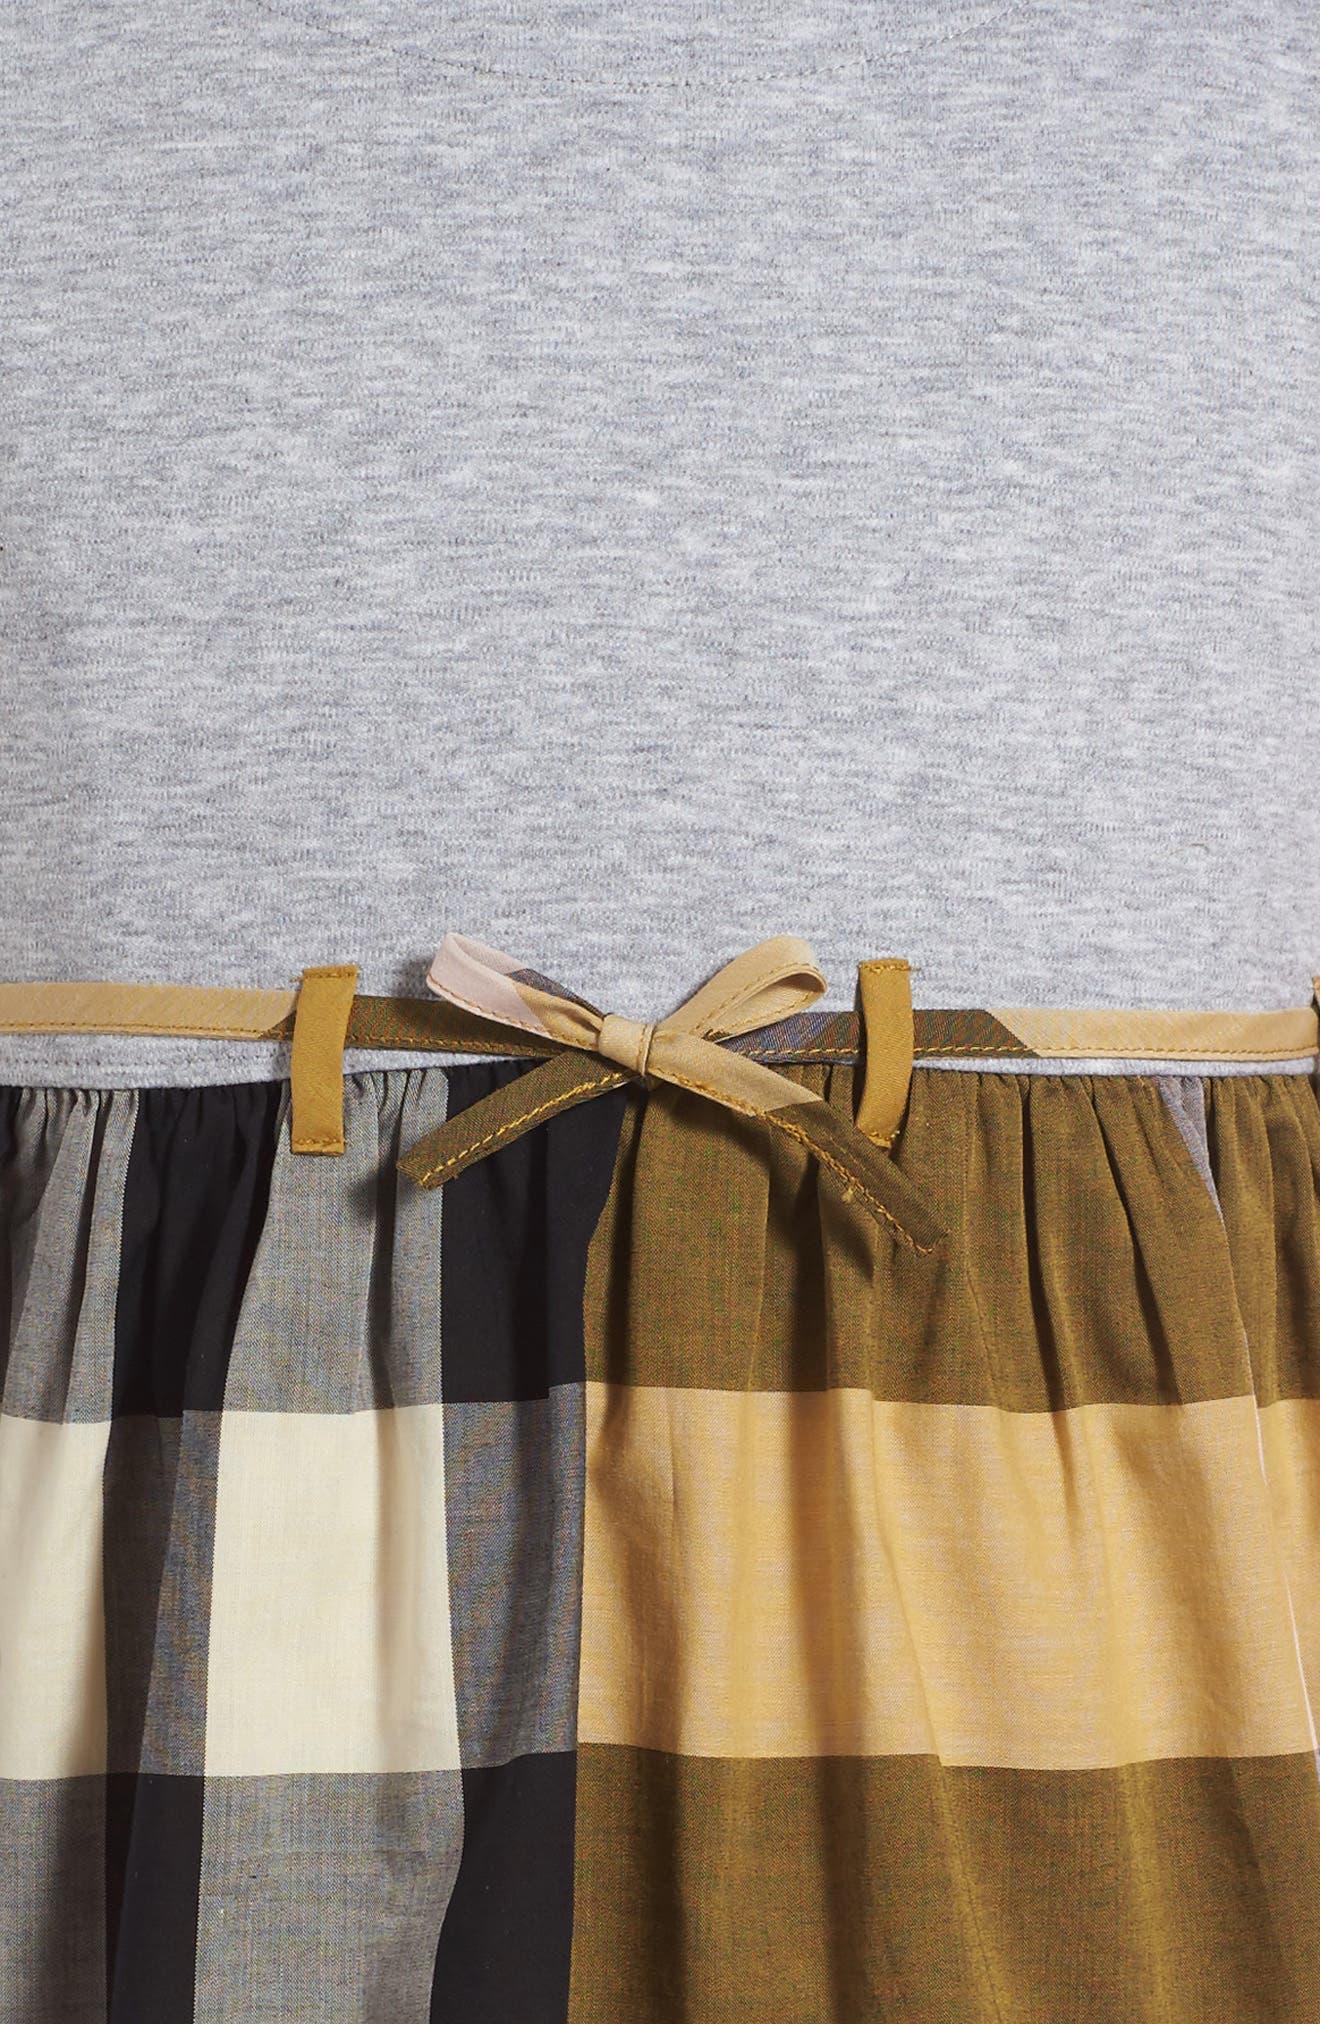 Rhonda Check Dress,                             Alternate thumbnail 3, color,                             704